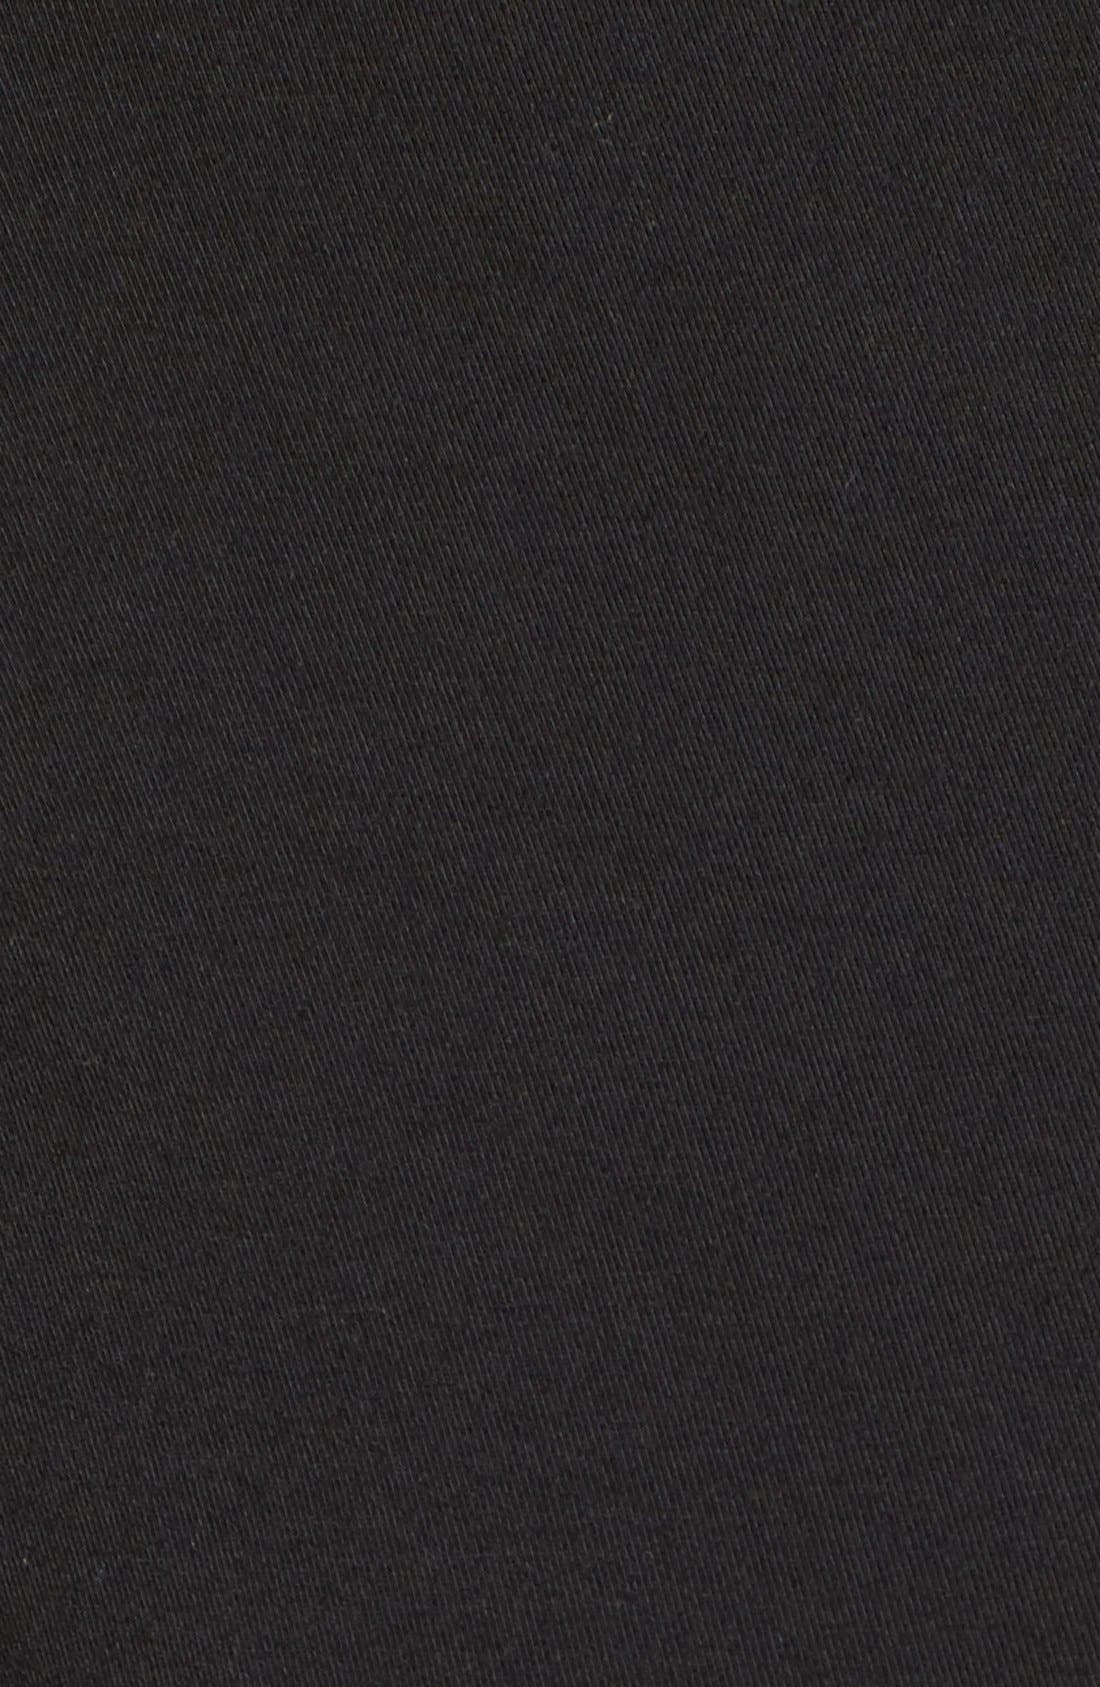 TART MATERNITY, Tart 'Peaches' Maternity Body-Con Dress, Alternate thumbnail 2, color, BLACK